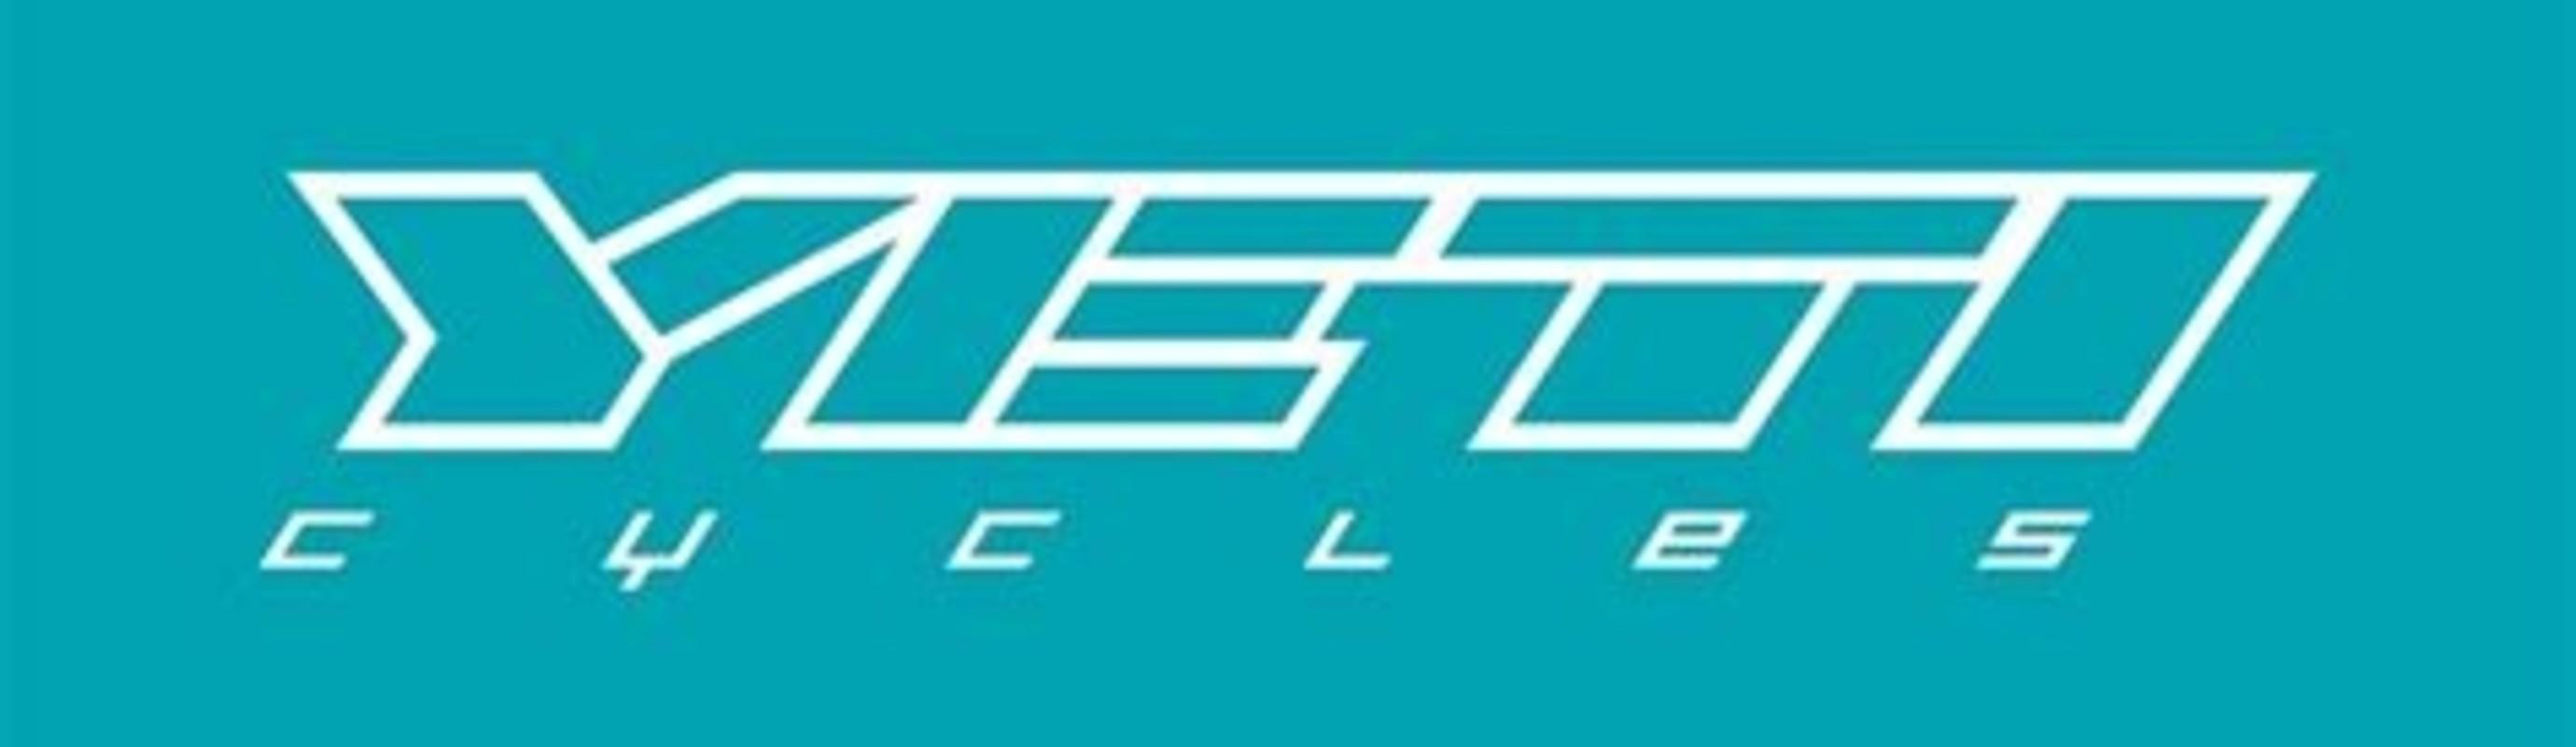 2020 Yeti SB130 First Look